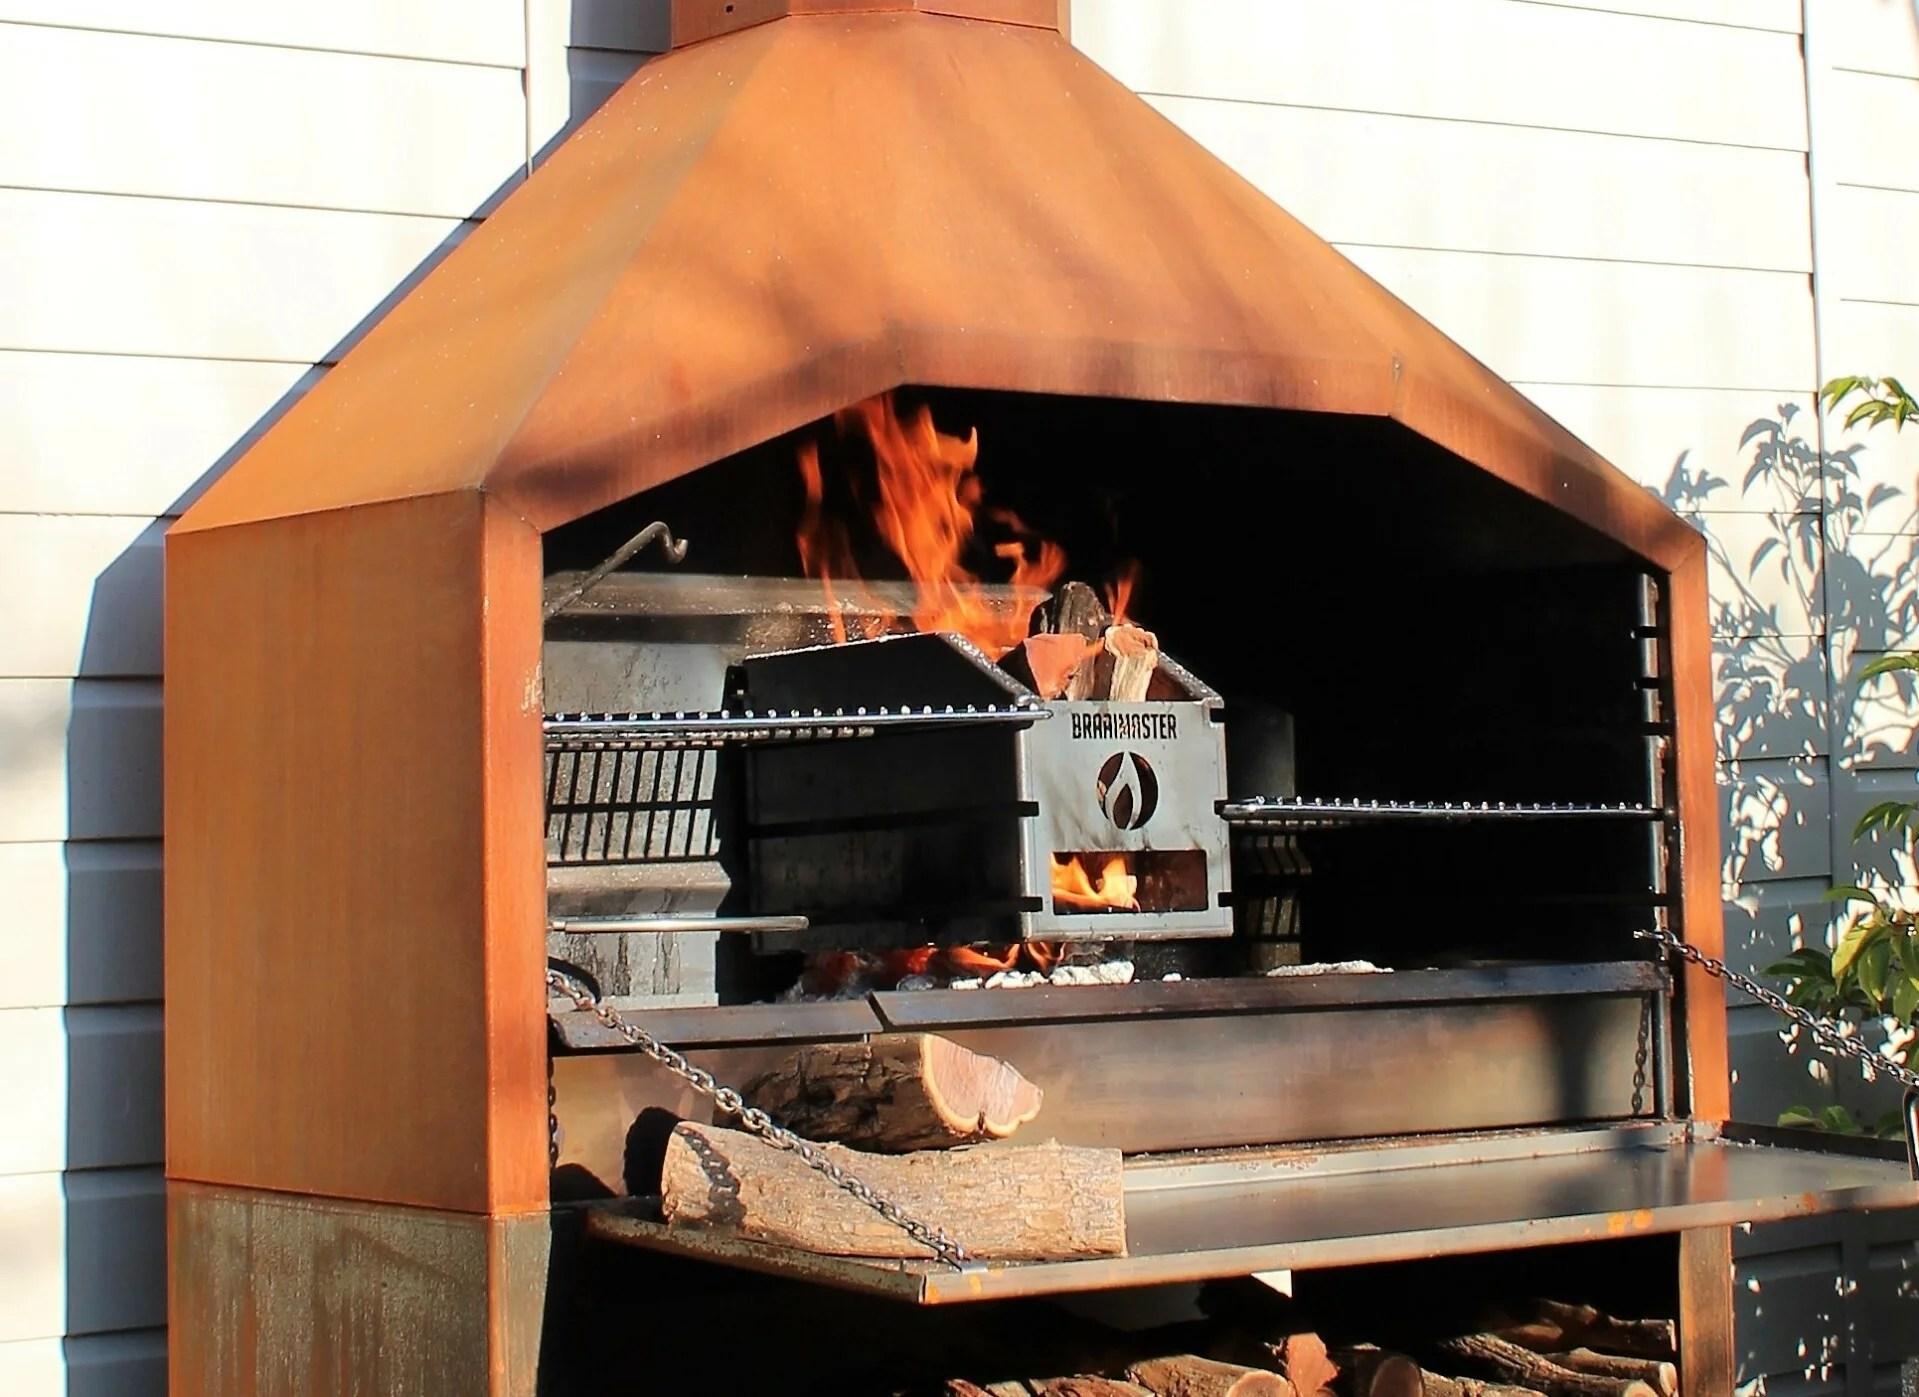 barbecue a bois braai sud africain pret